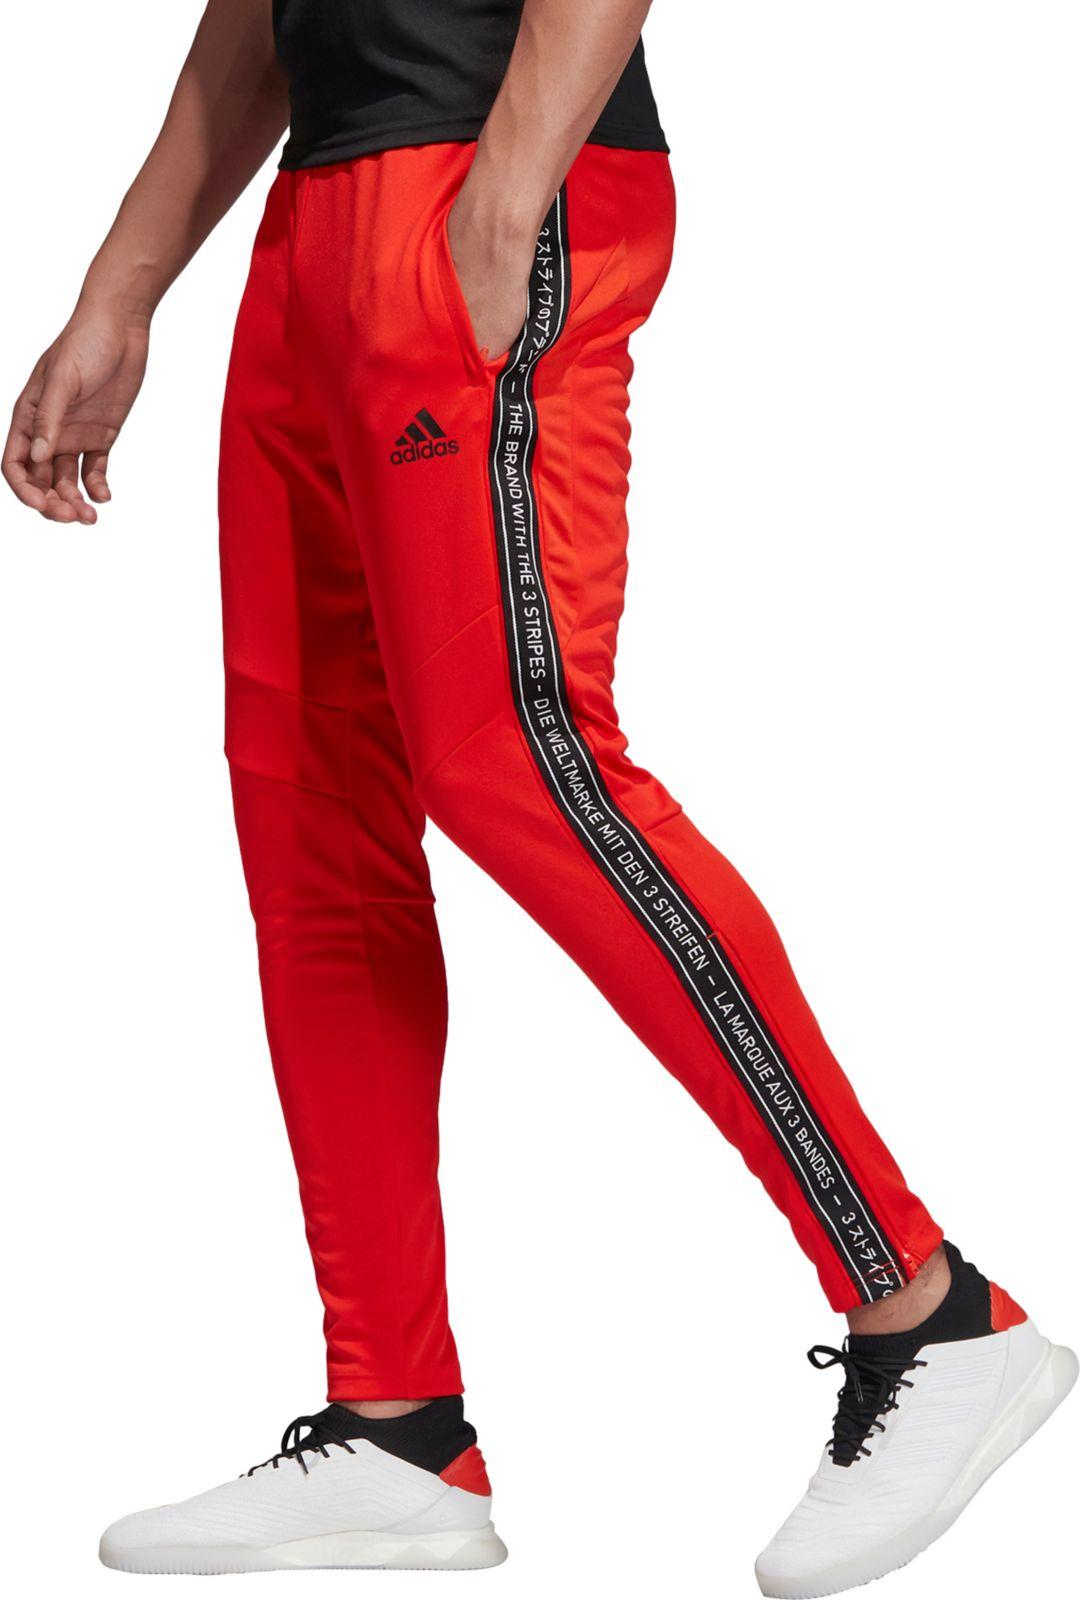 592138804ac4e adidas Men's Tiro 19 Taped Training Pants